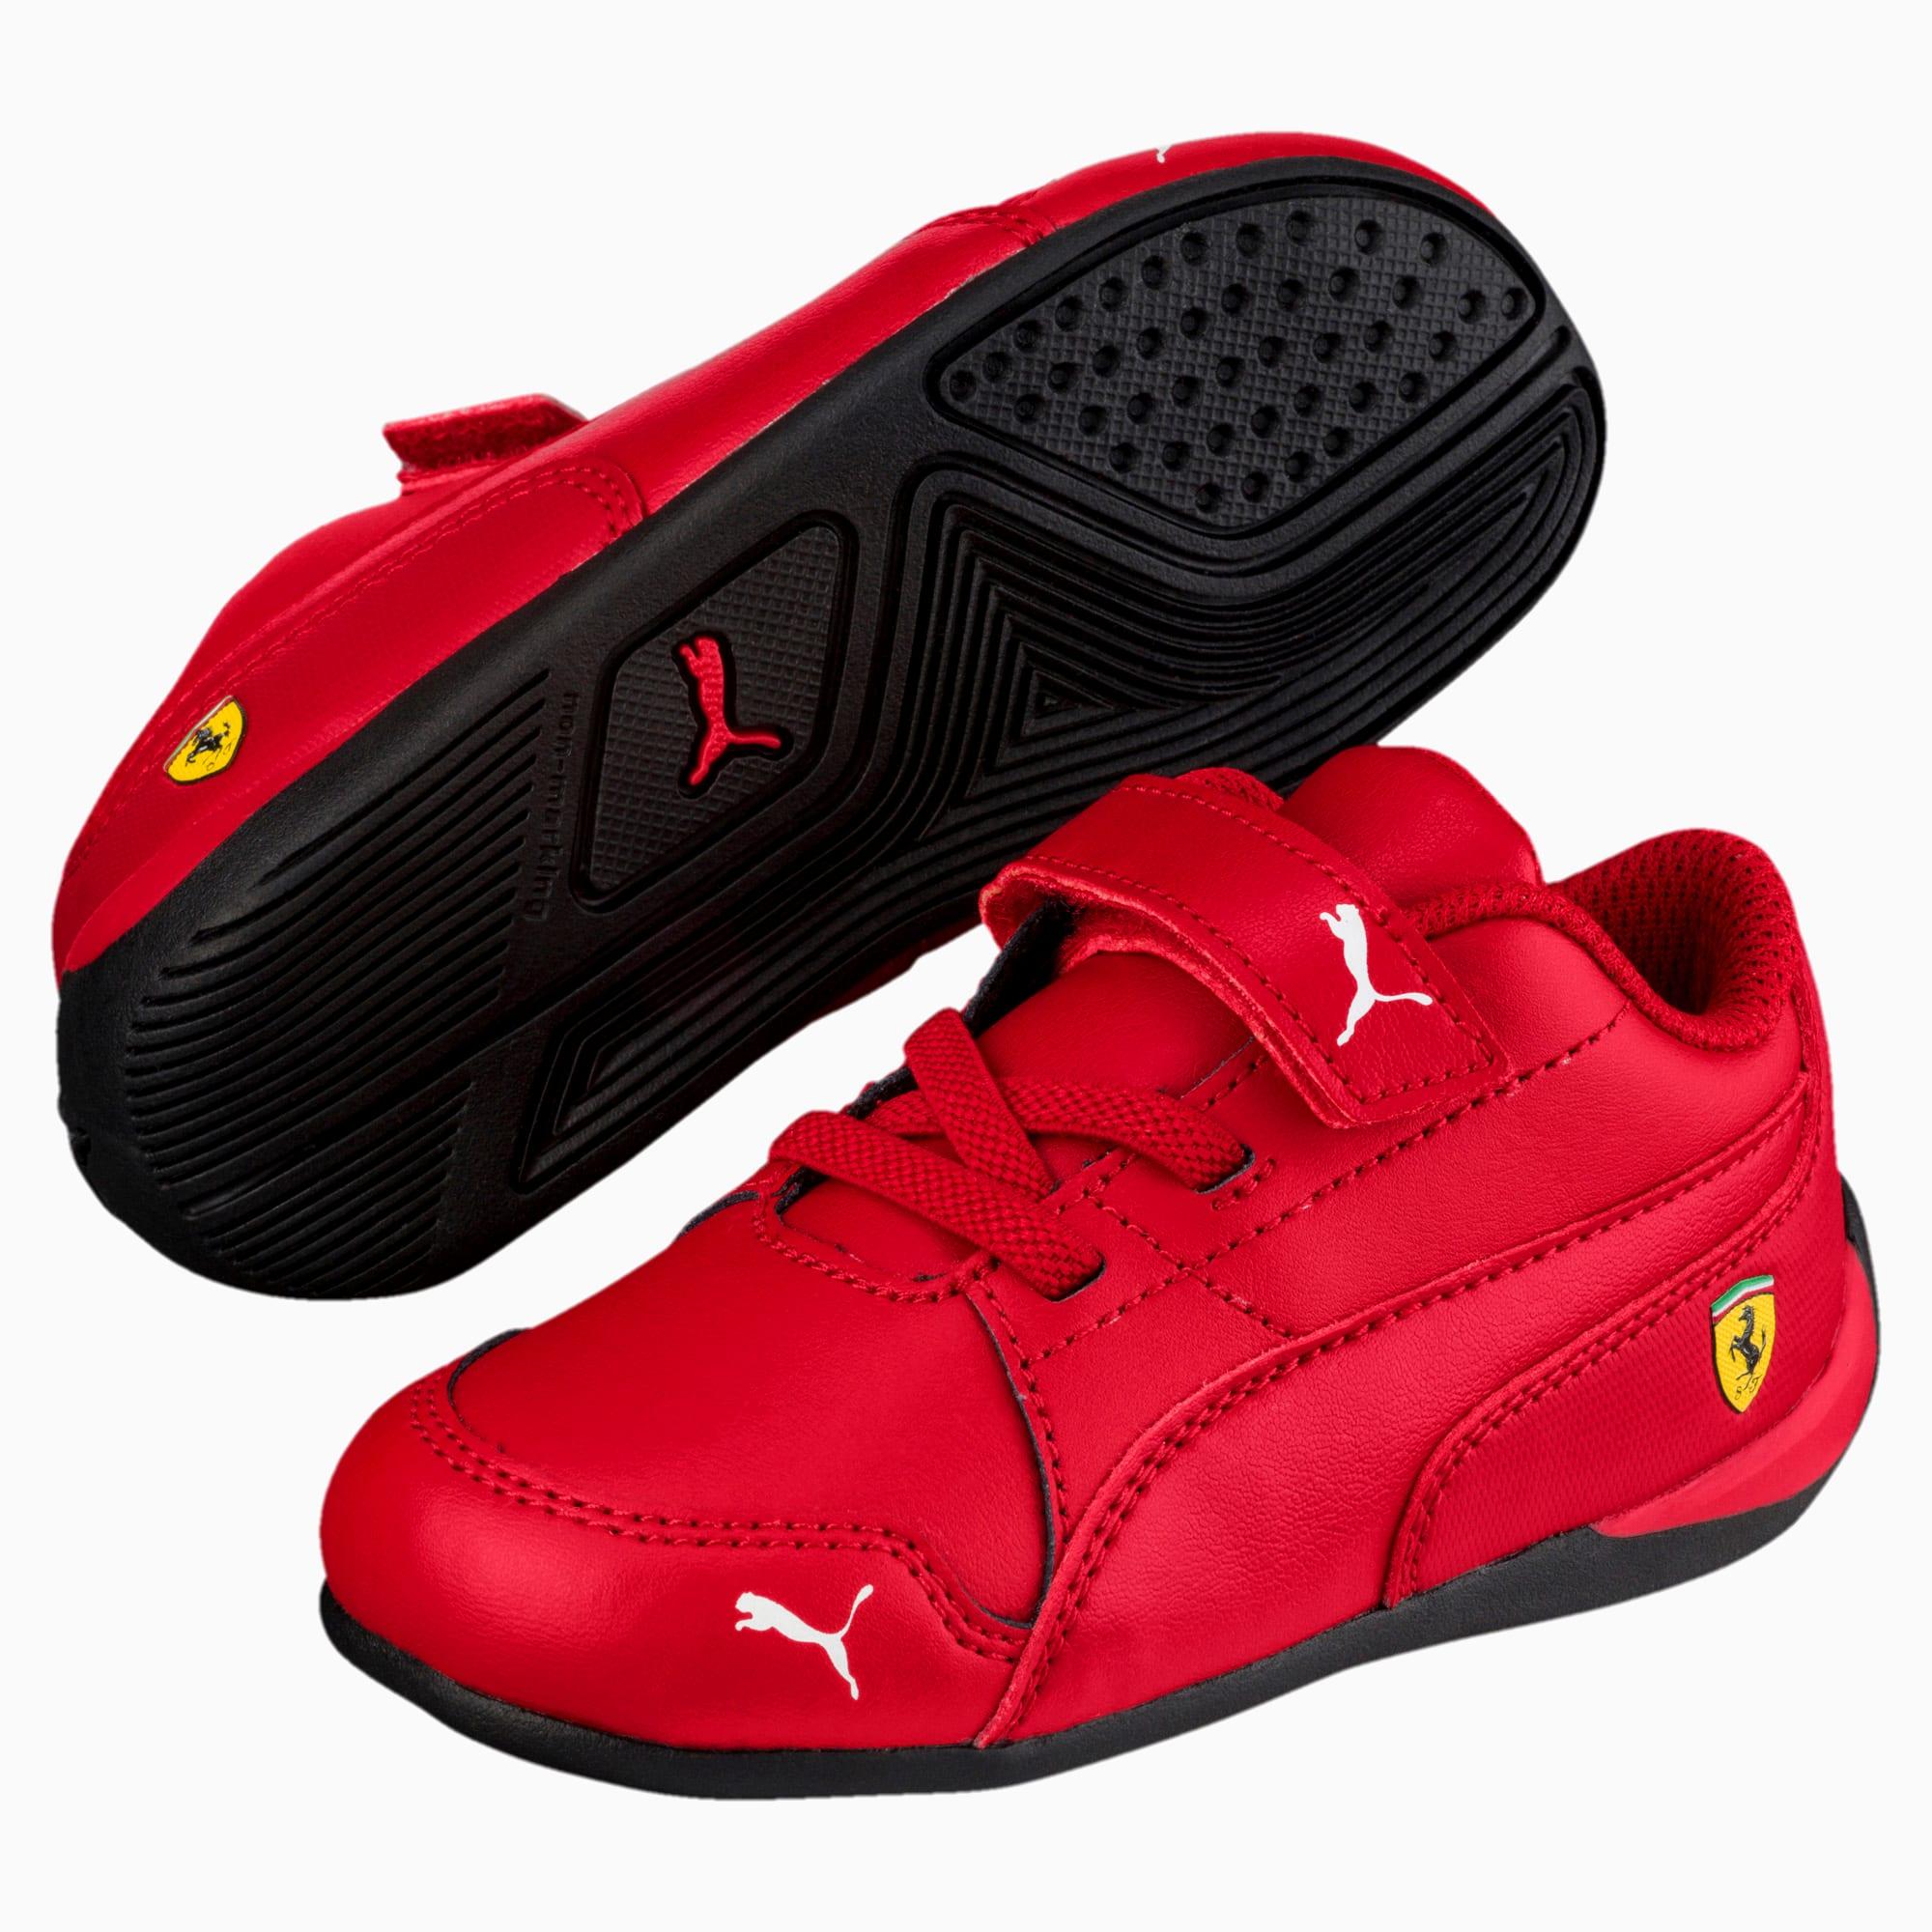 chaussure puma ferrari enfant